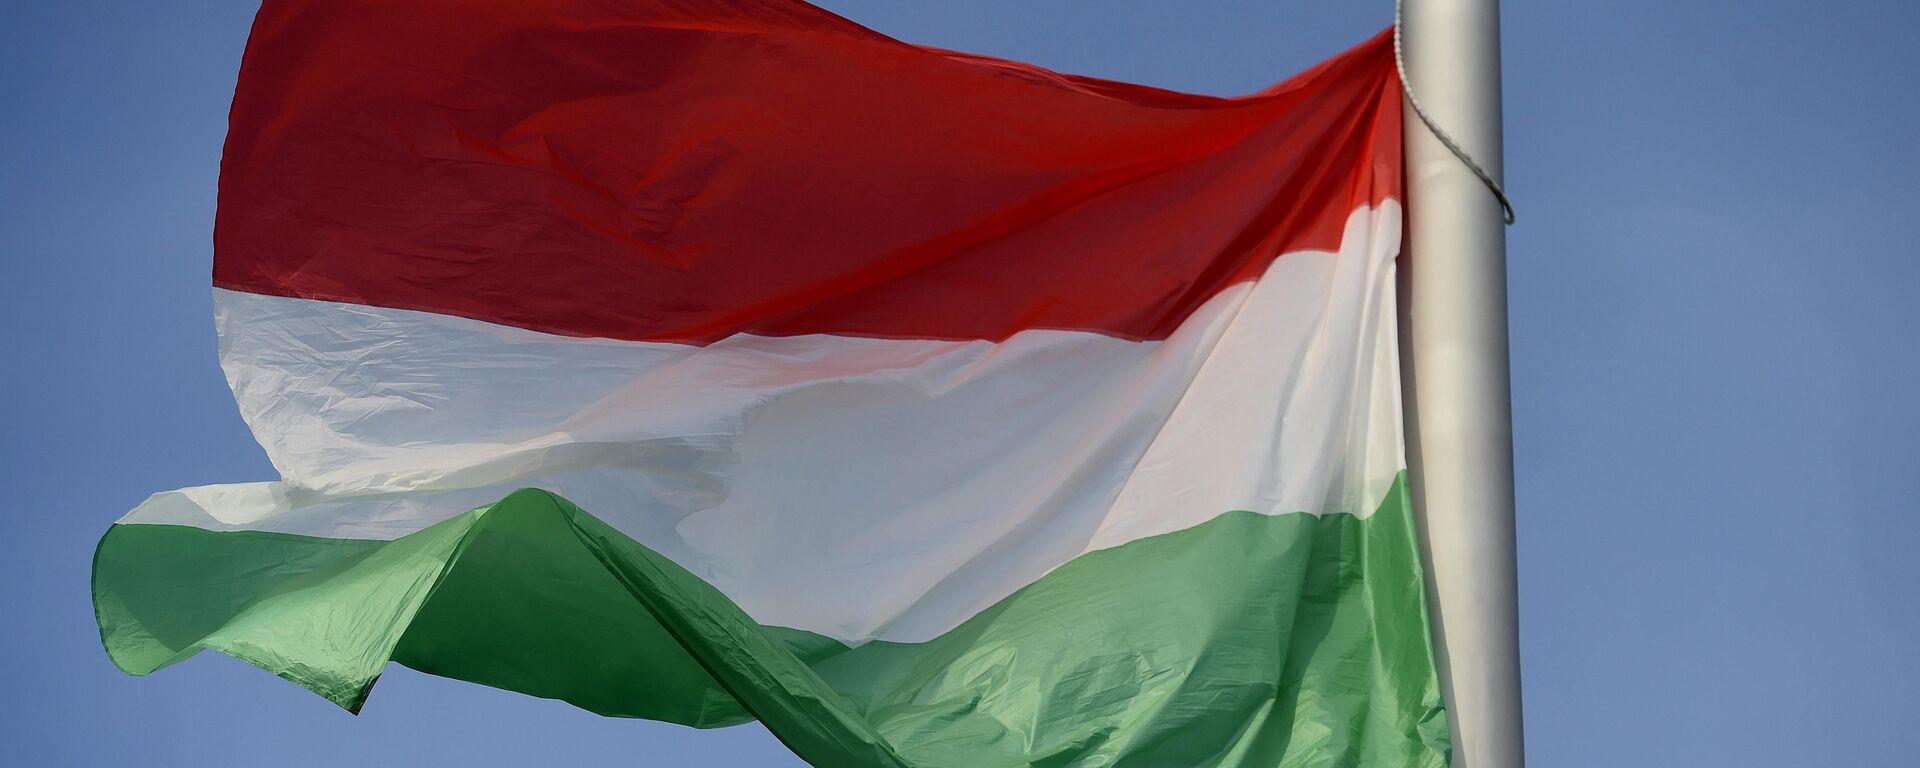 Zastava Mađarske - Sputnik Srbija, 1920, 09.10.2021